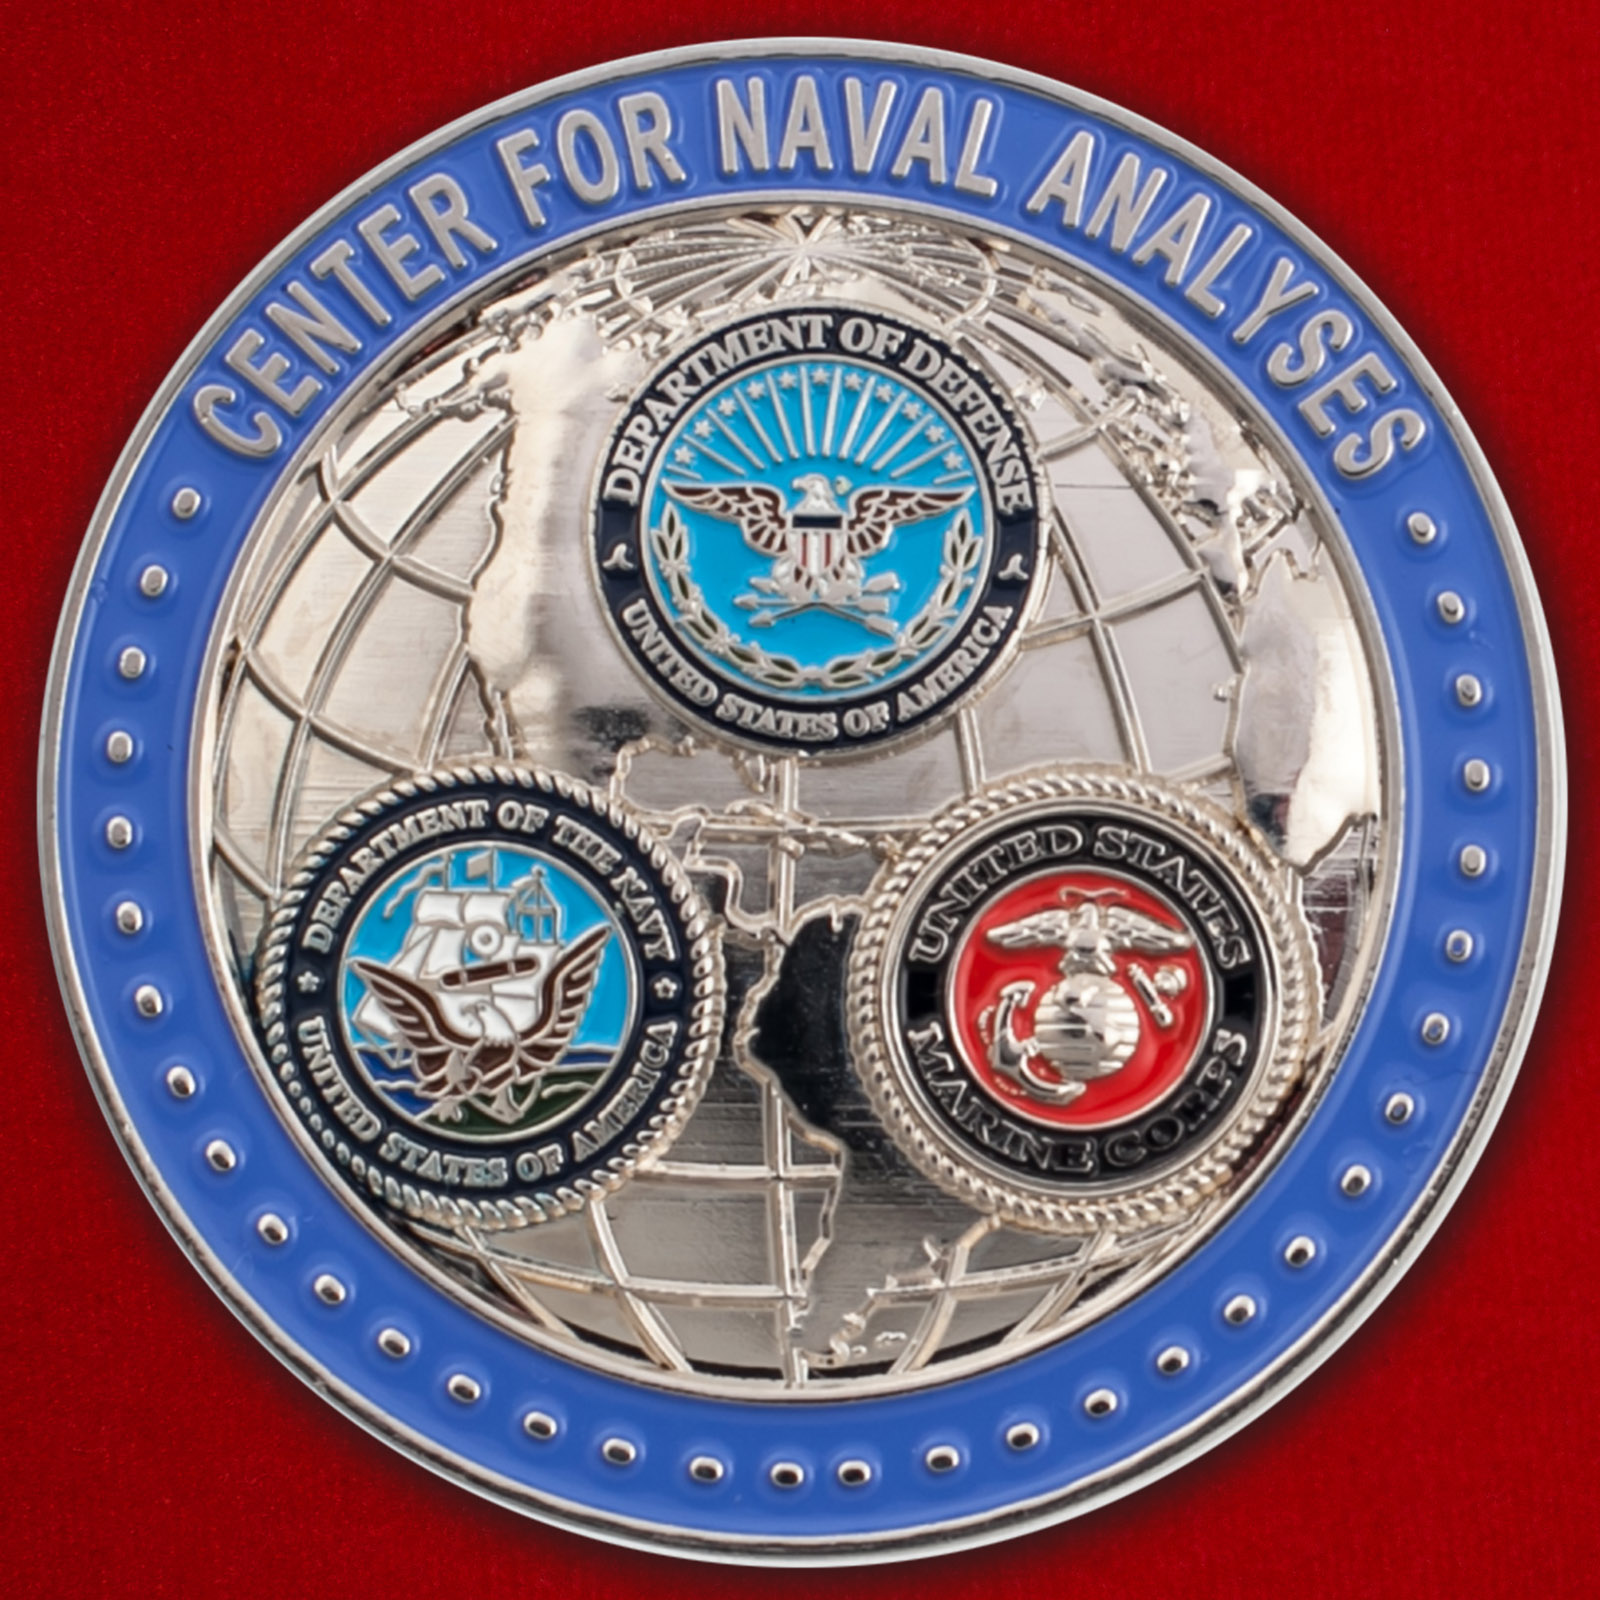 Челлендж коин Аналитического центра ВМС США